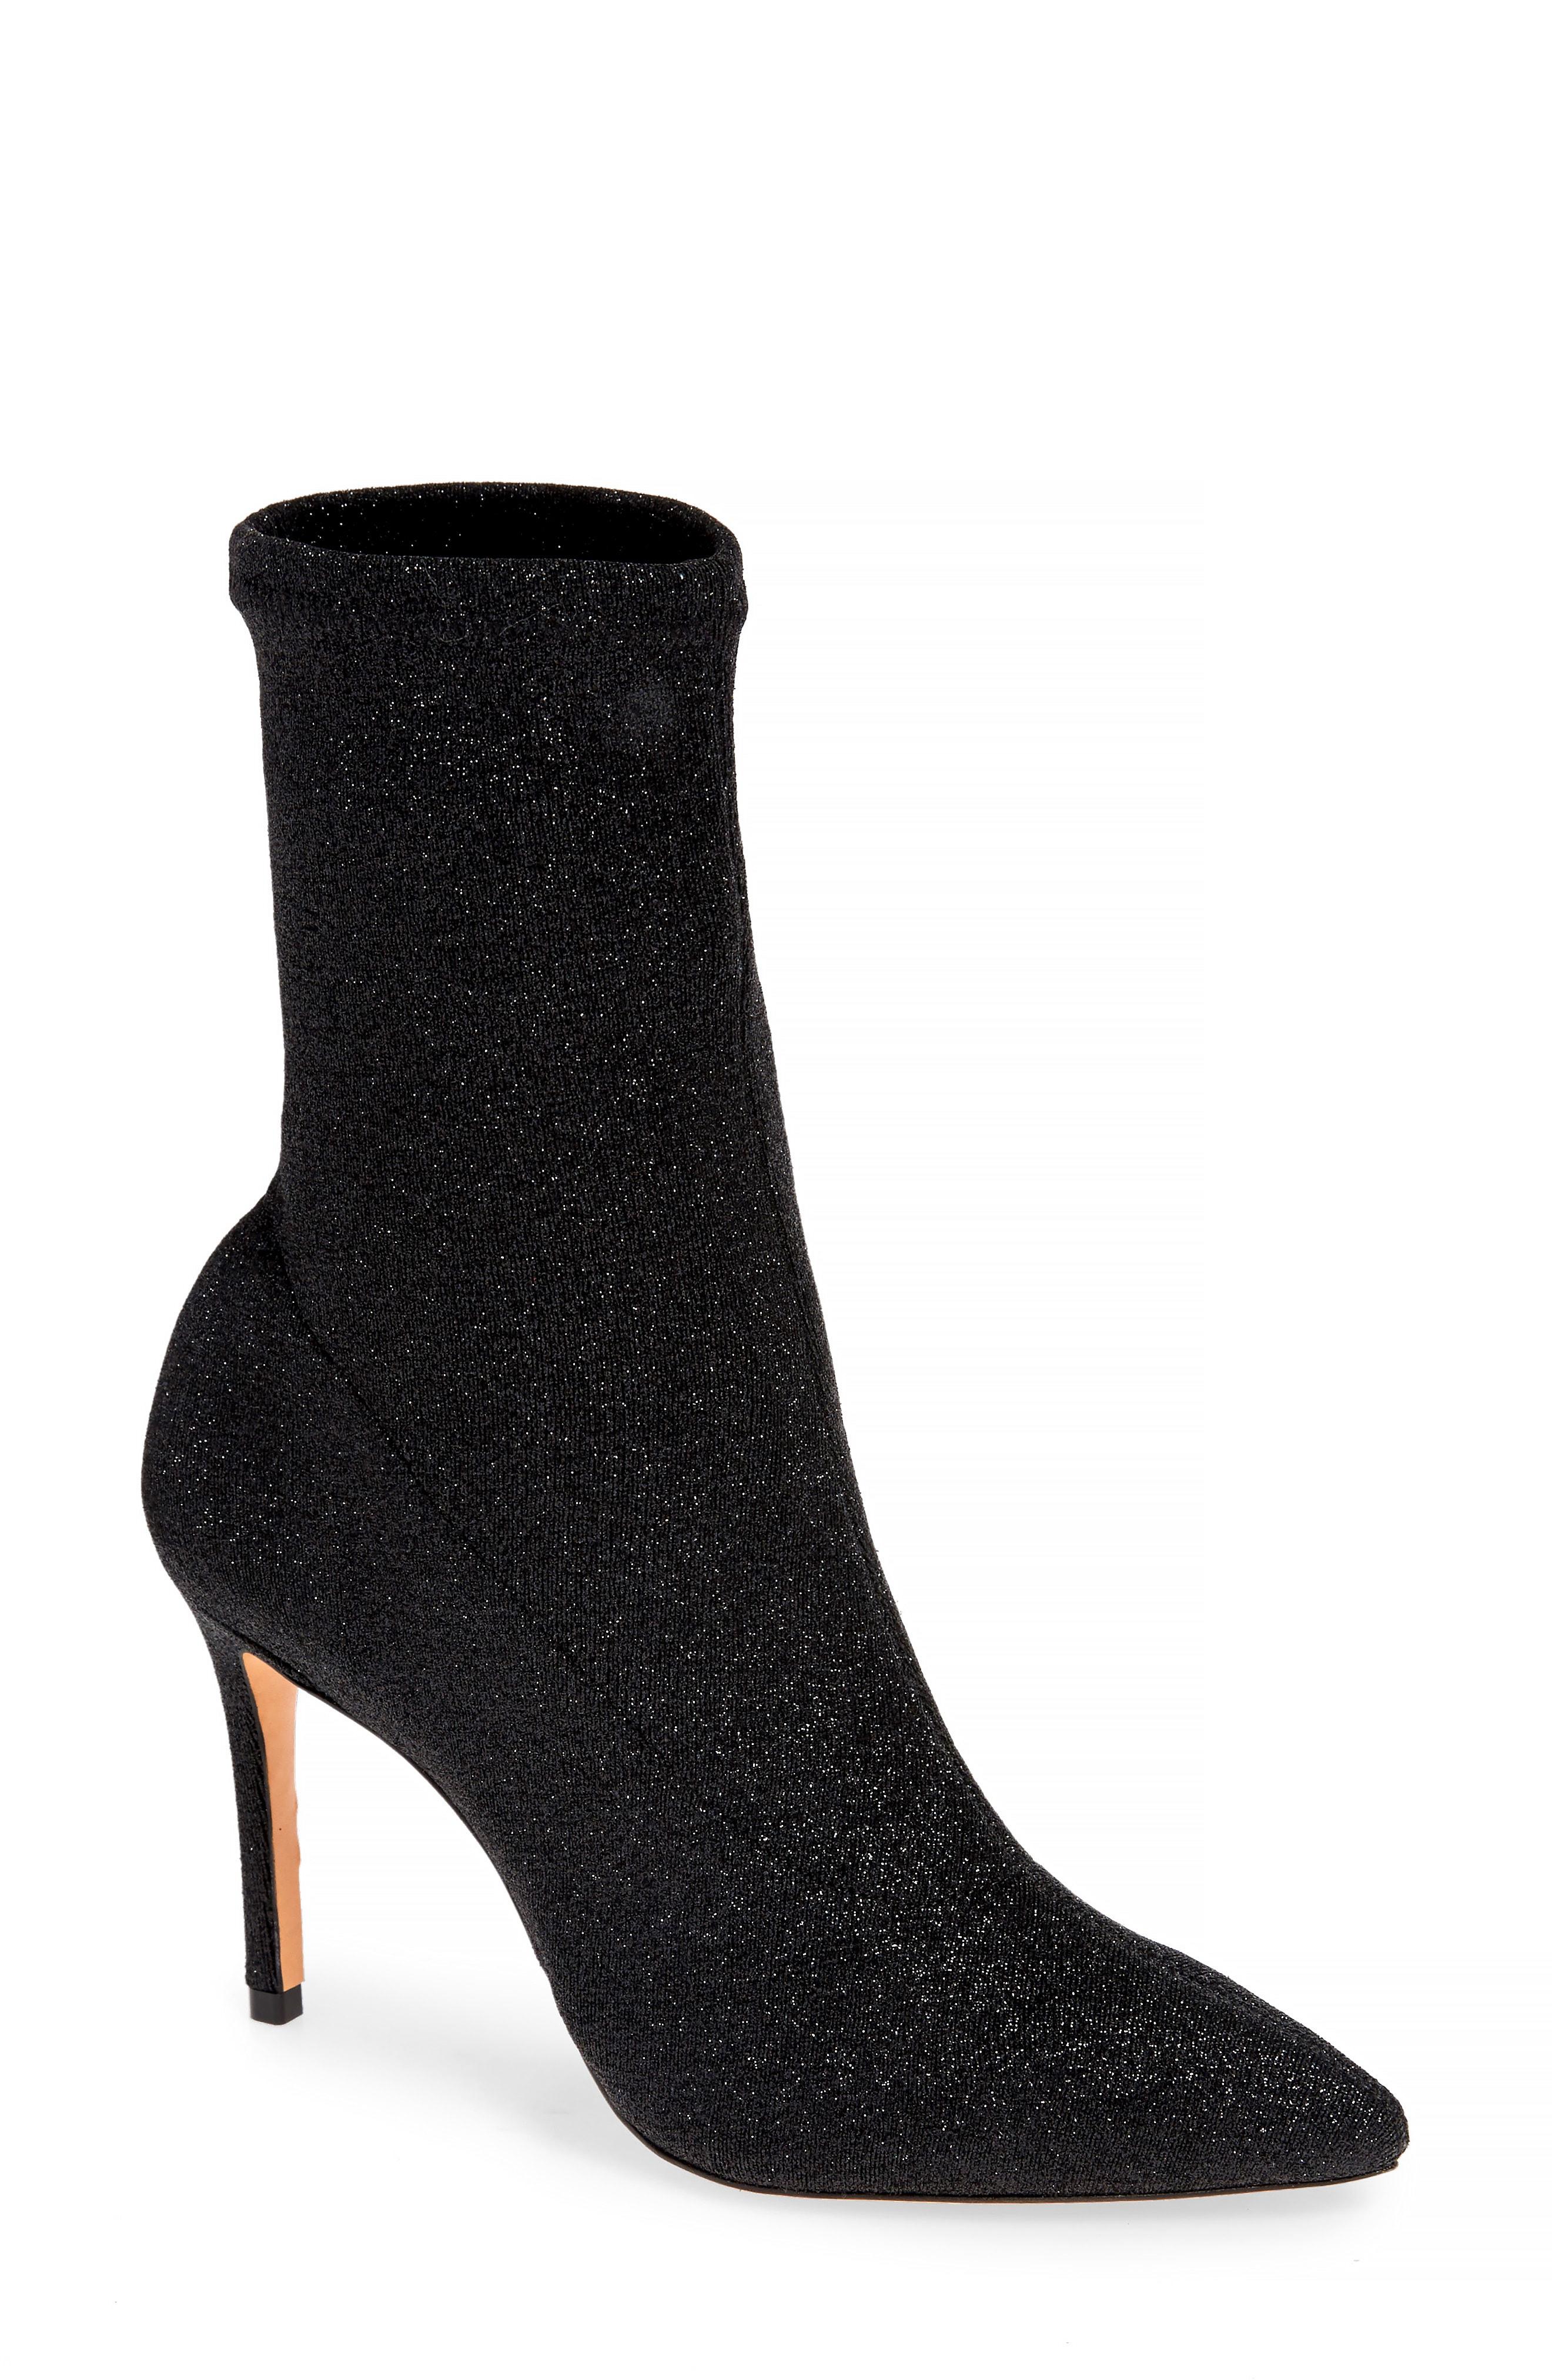 Schutz Sciarpe Glitter Sock Bootie (Women)